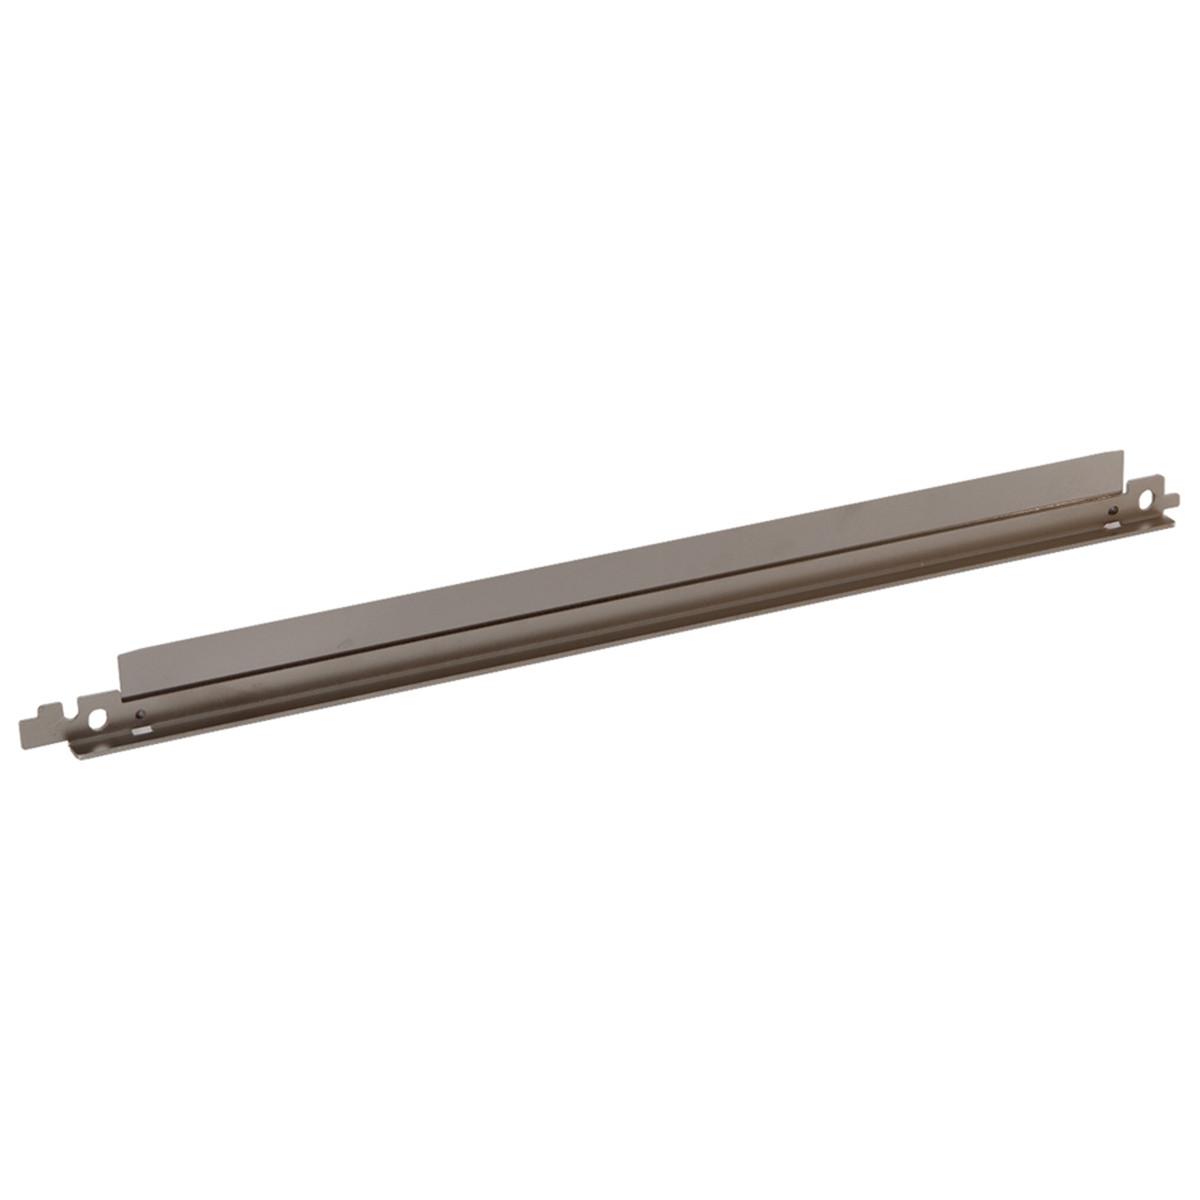 Lâmina Dosadora HP CE410A   410A   10A   HP M351, M451, M475, M375   Importado